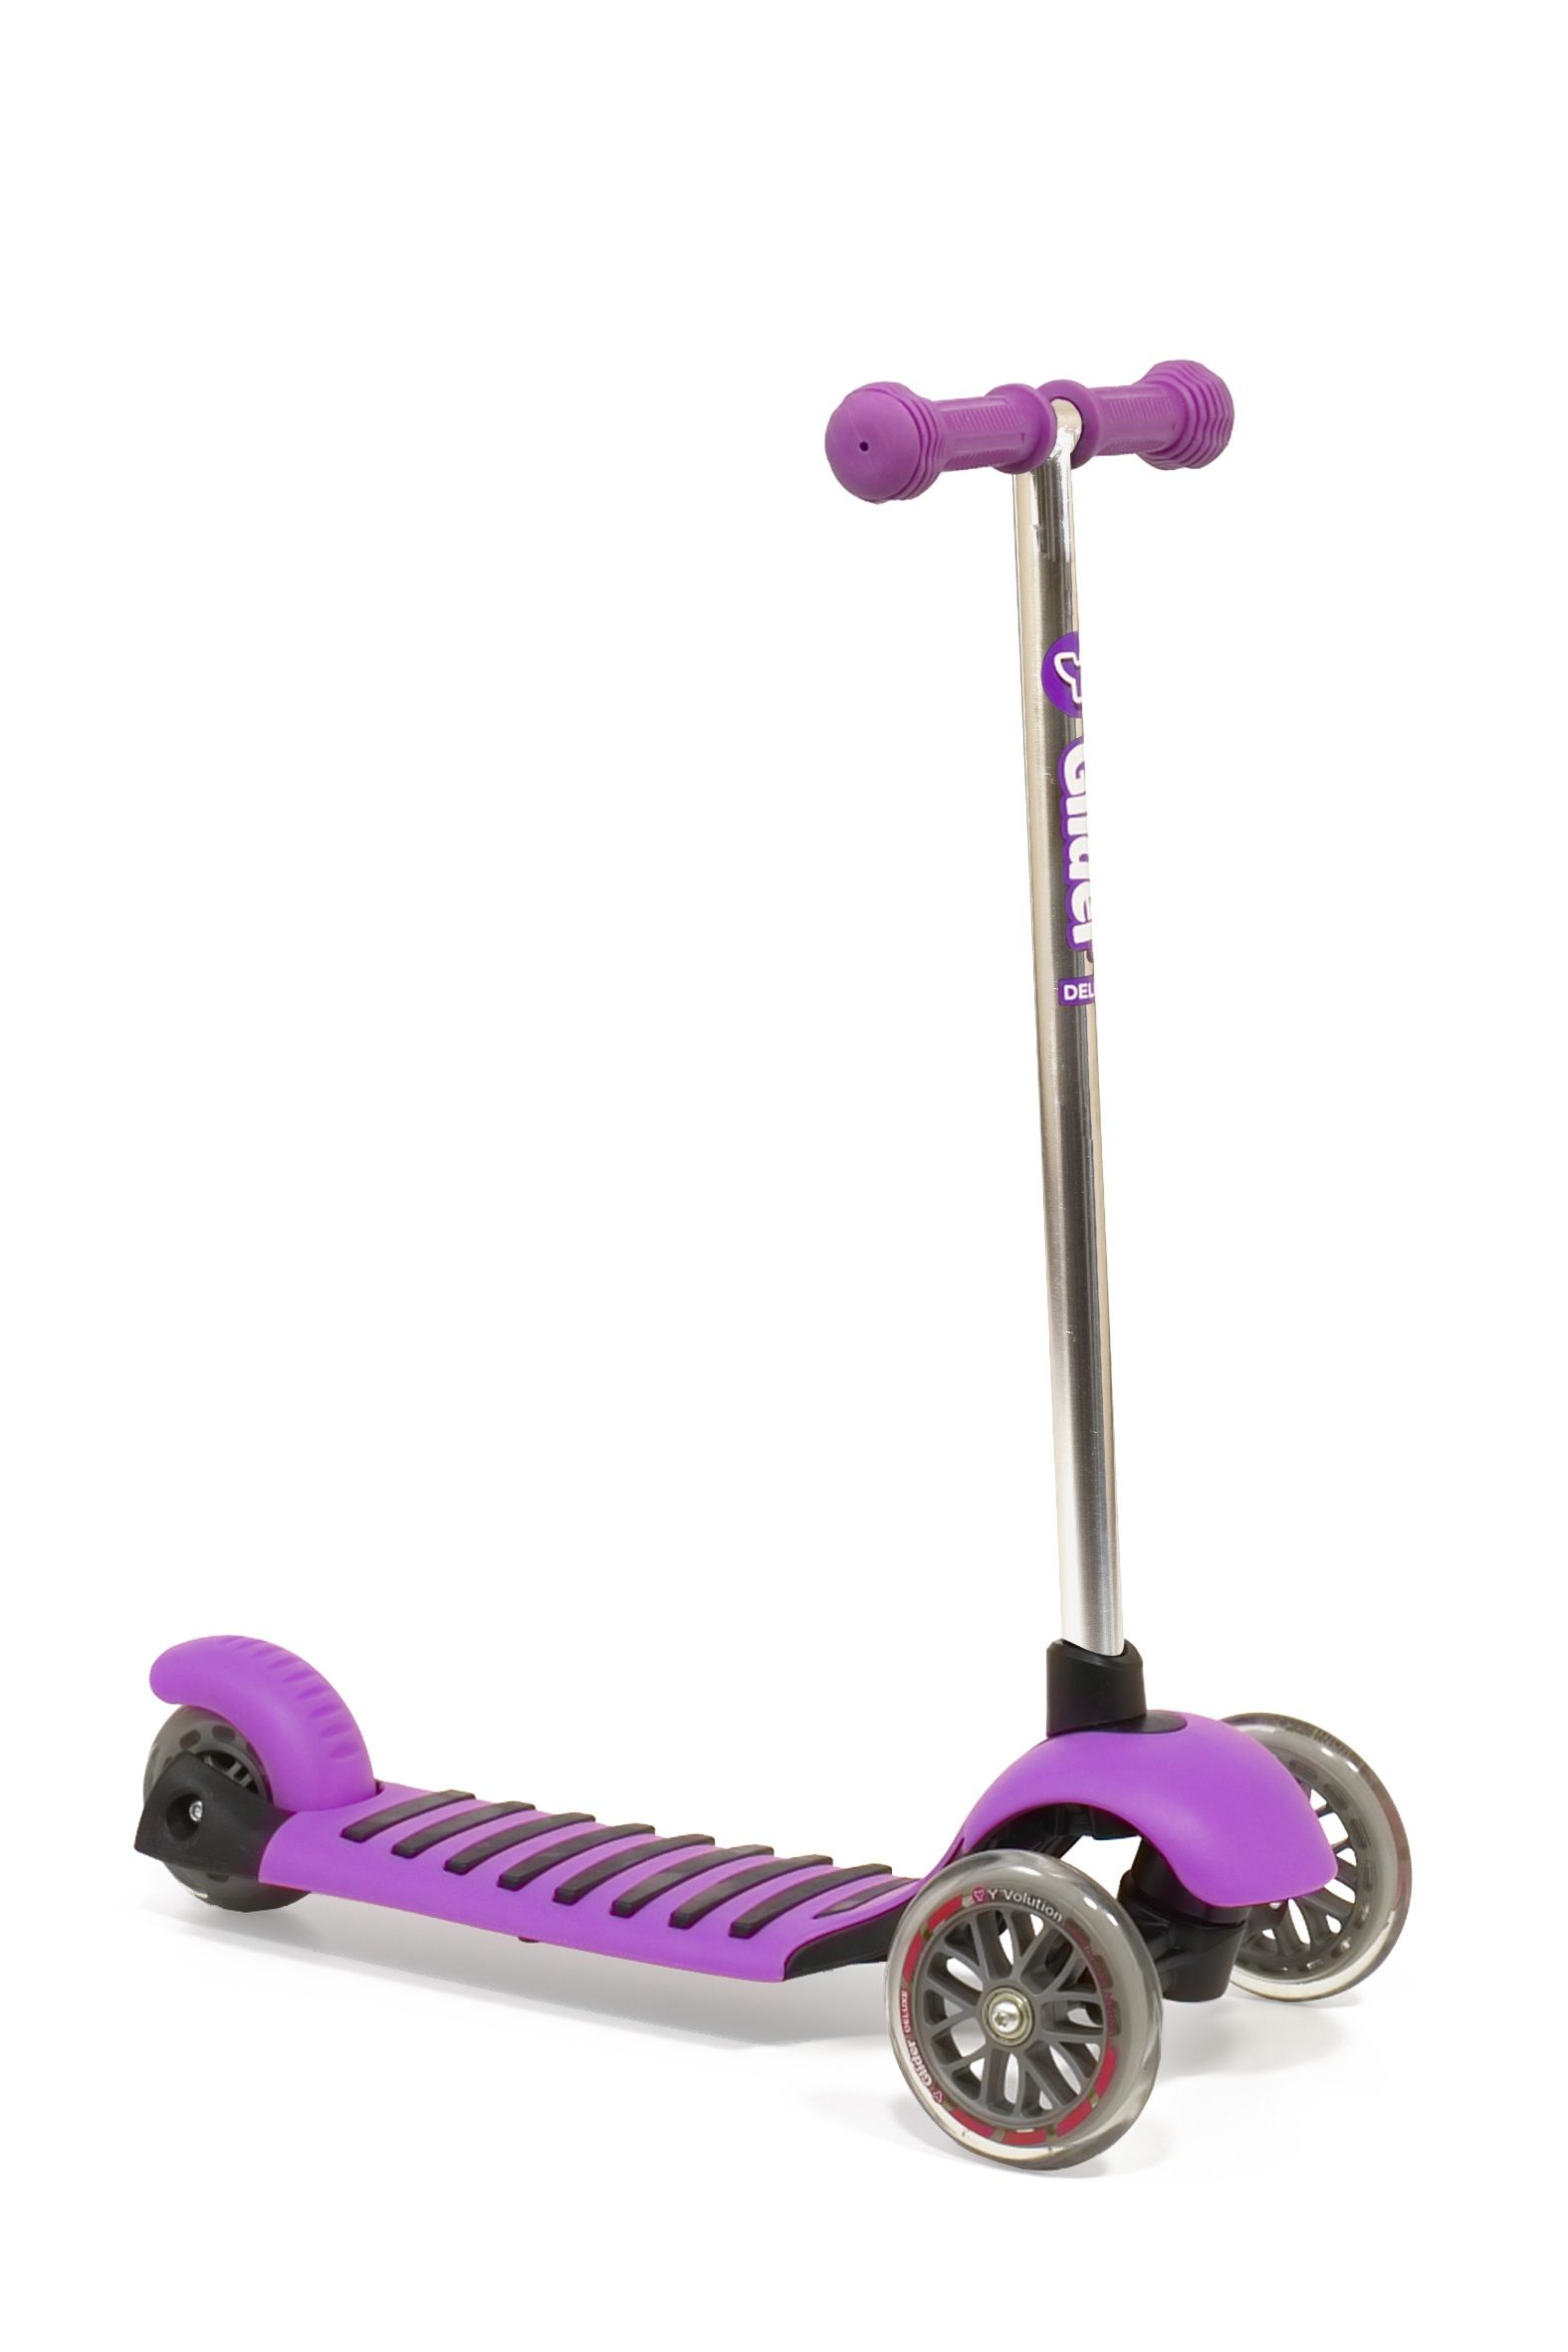 Y Glider 3 Wheel Scooter Kids Scooter Y Glider Deluxe Purple